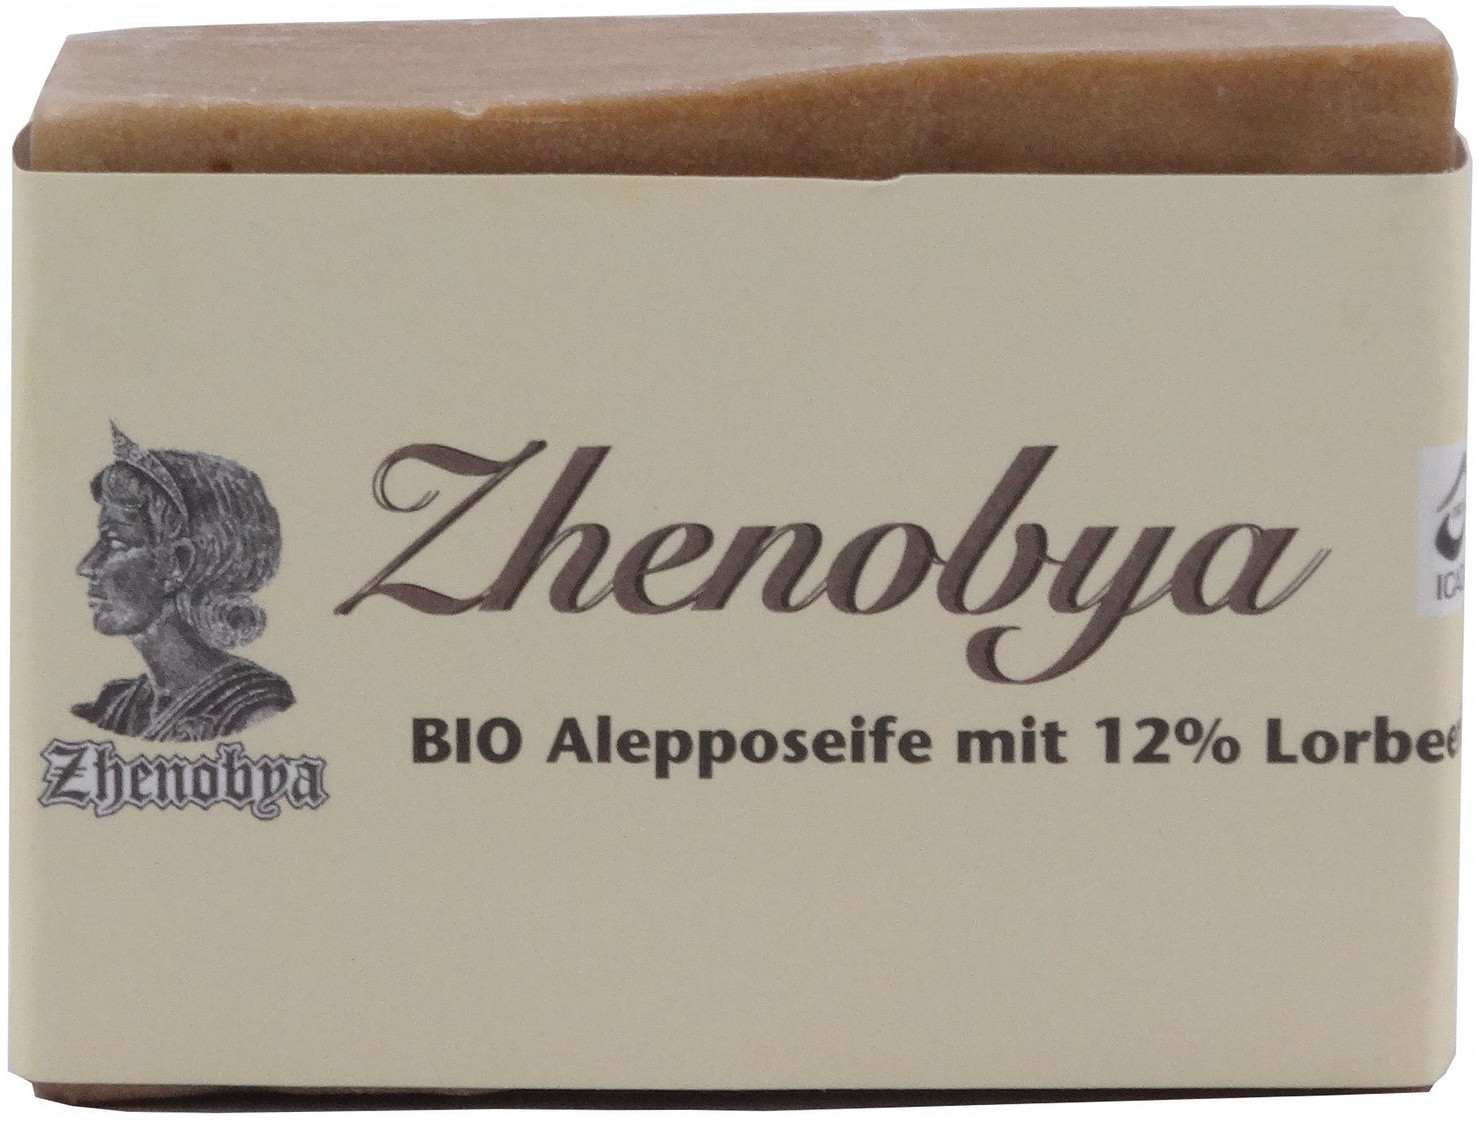 Zhenobya Aleppo-Seife 88% Oliven-/ 12% Lorbeeröl (200g)